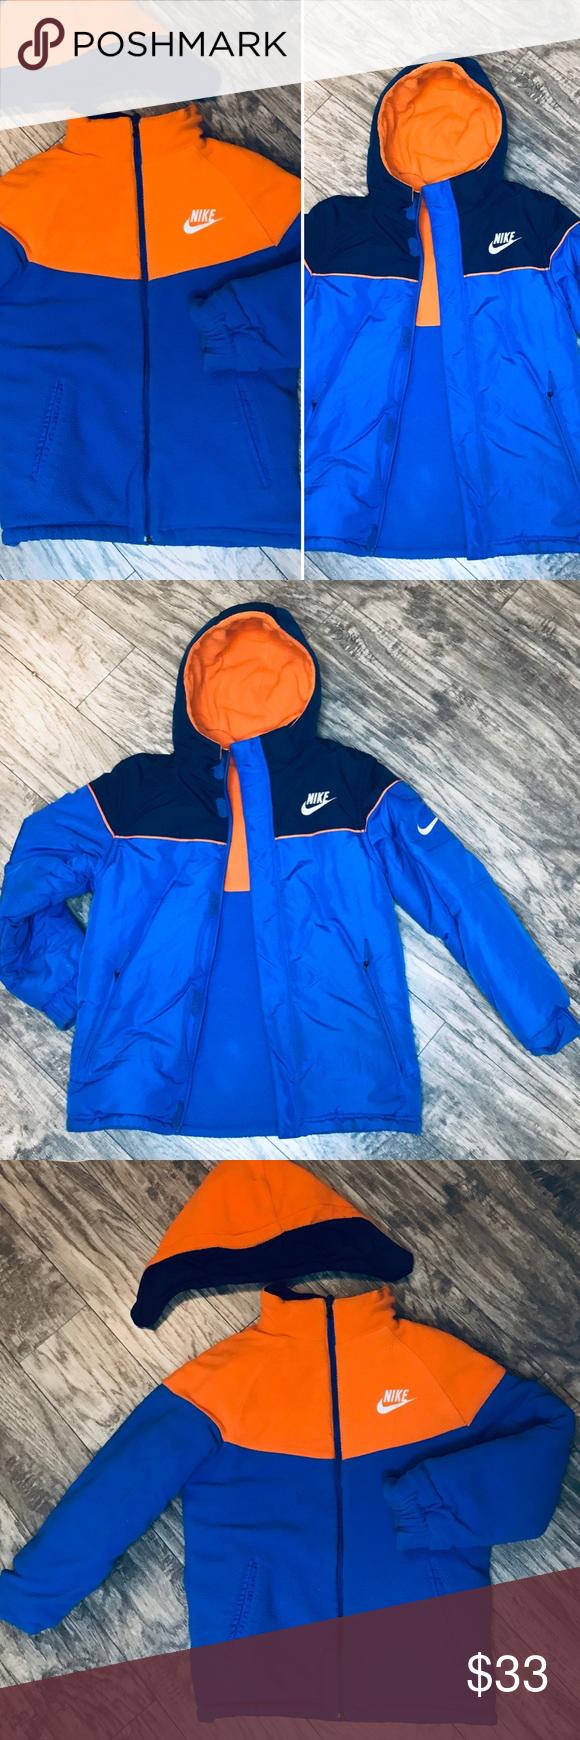 Nike Puffer Jacket Reversible Hooded Size Medium Nike Jacket Nike Winter Jackets Nike Puffer Jacket [ 1740 x 580 Pixel ]